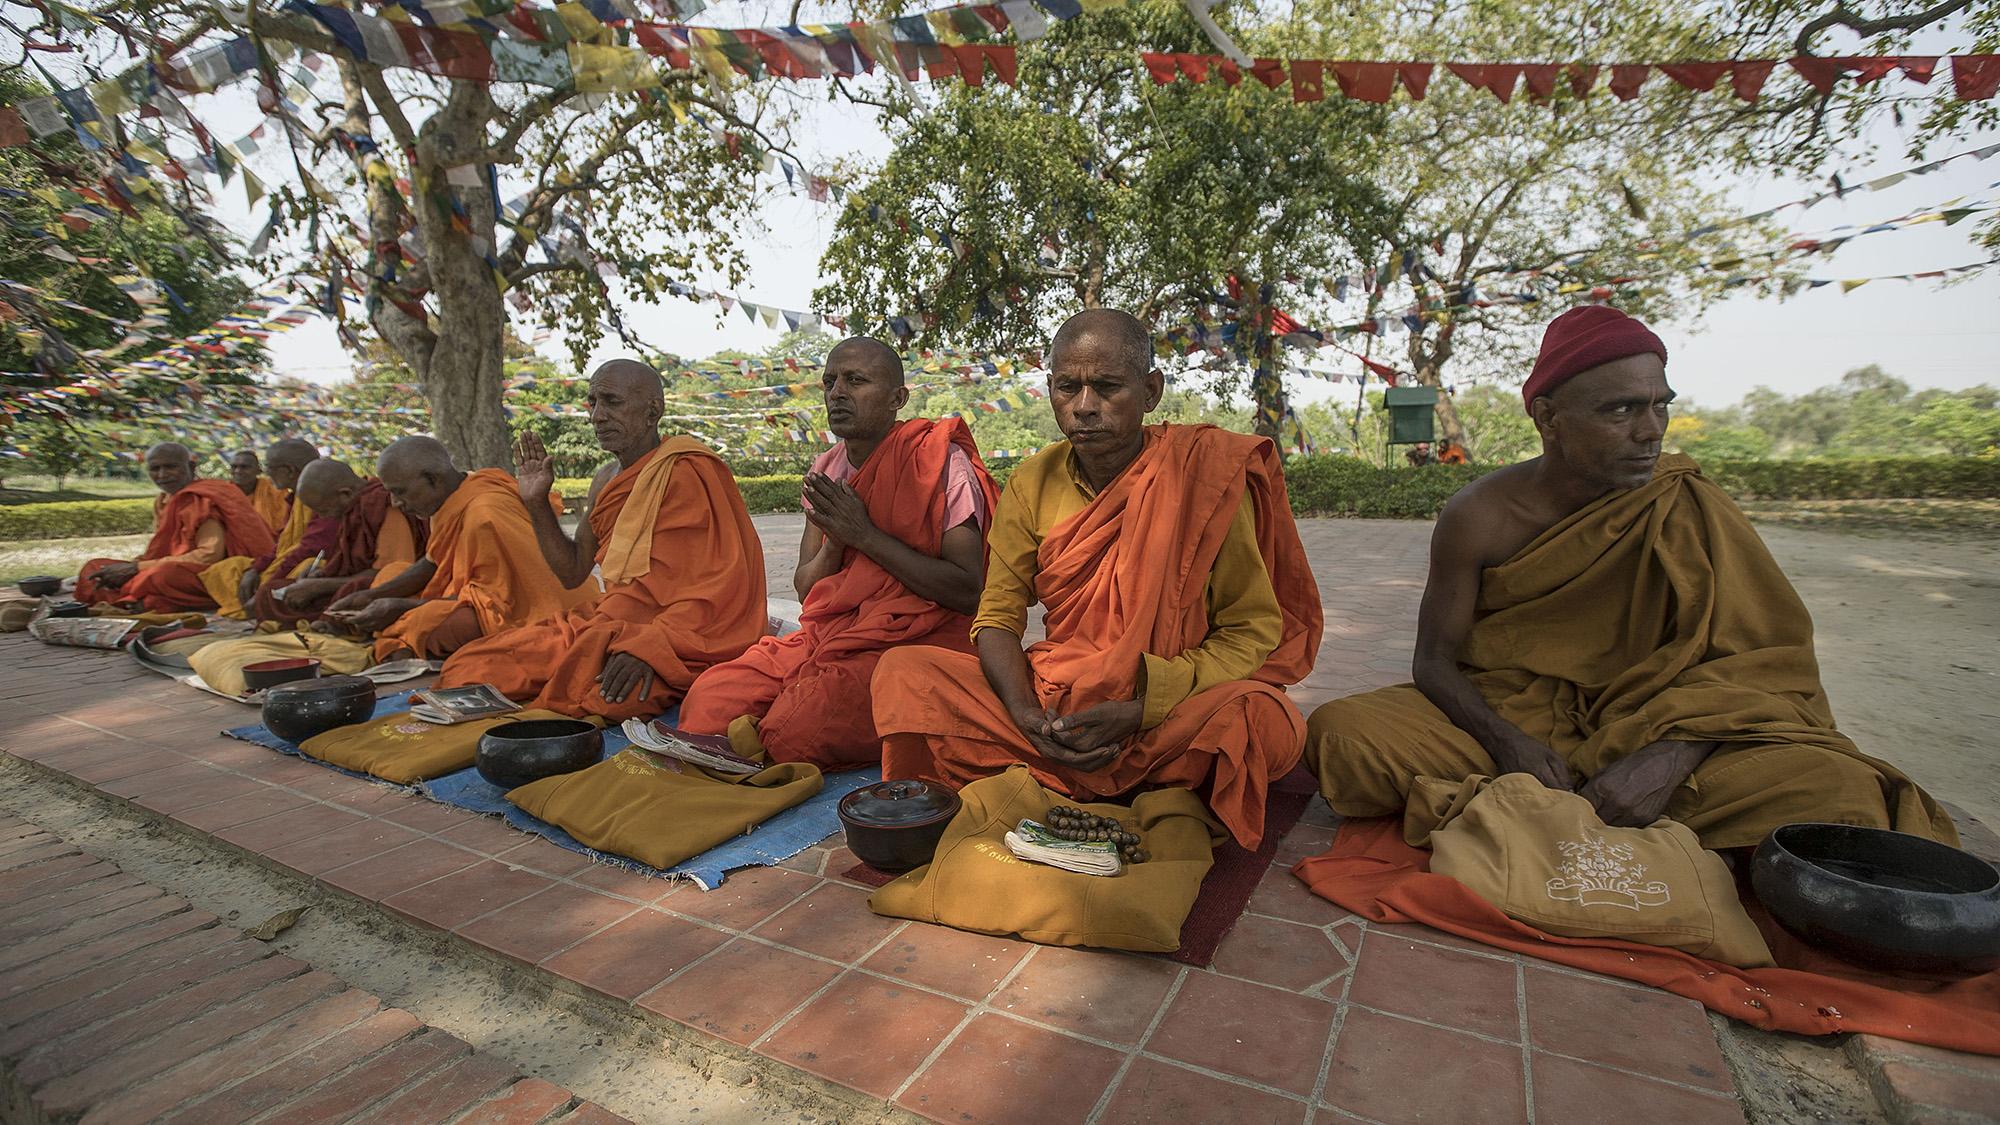 Holy men at the birthplace of the Buddha, Lumbini, Nepal.